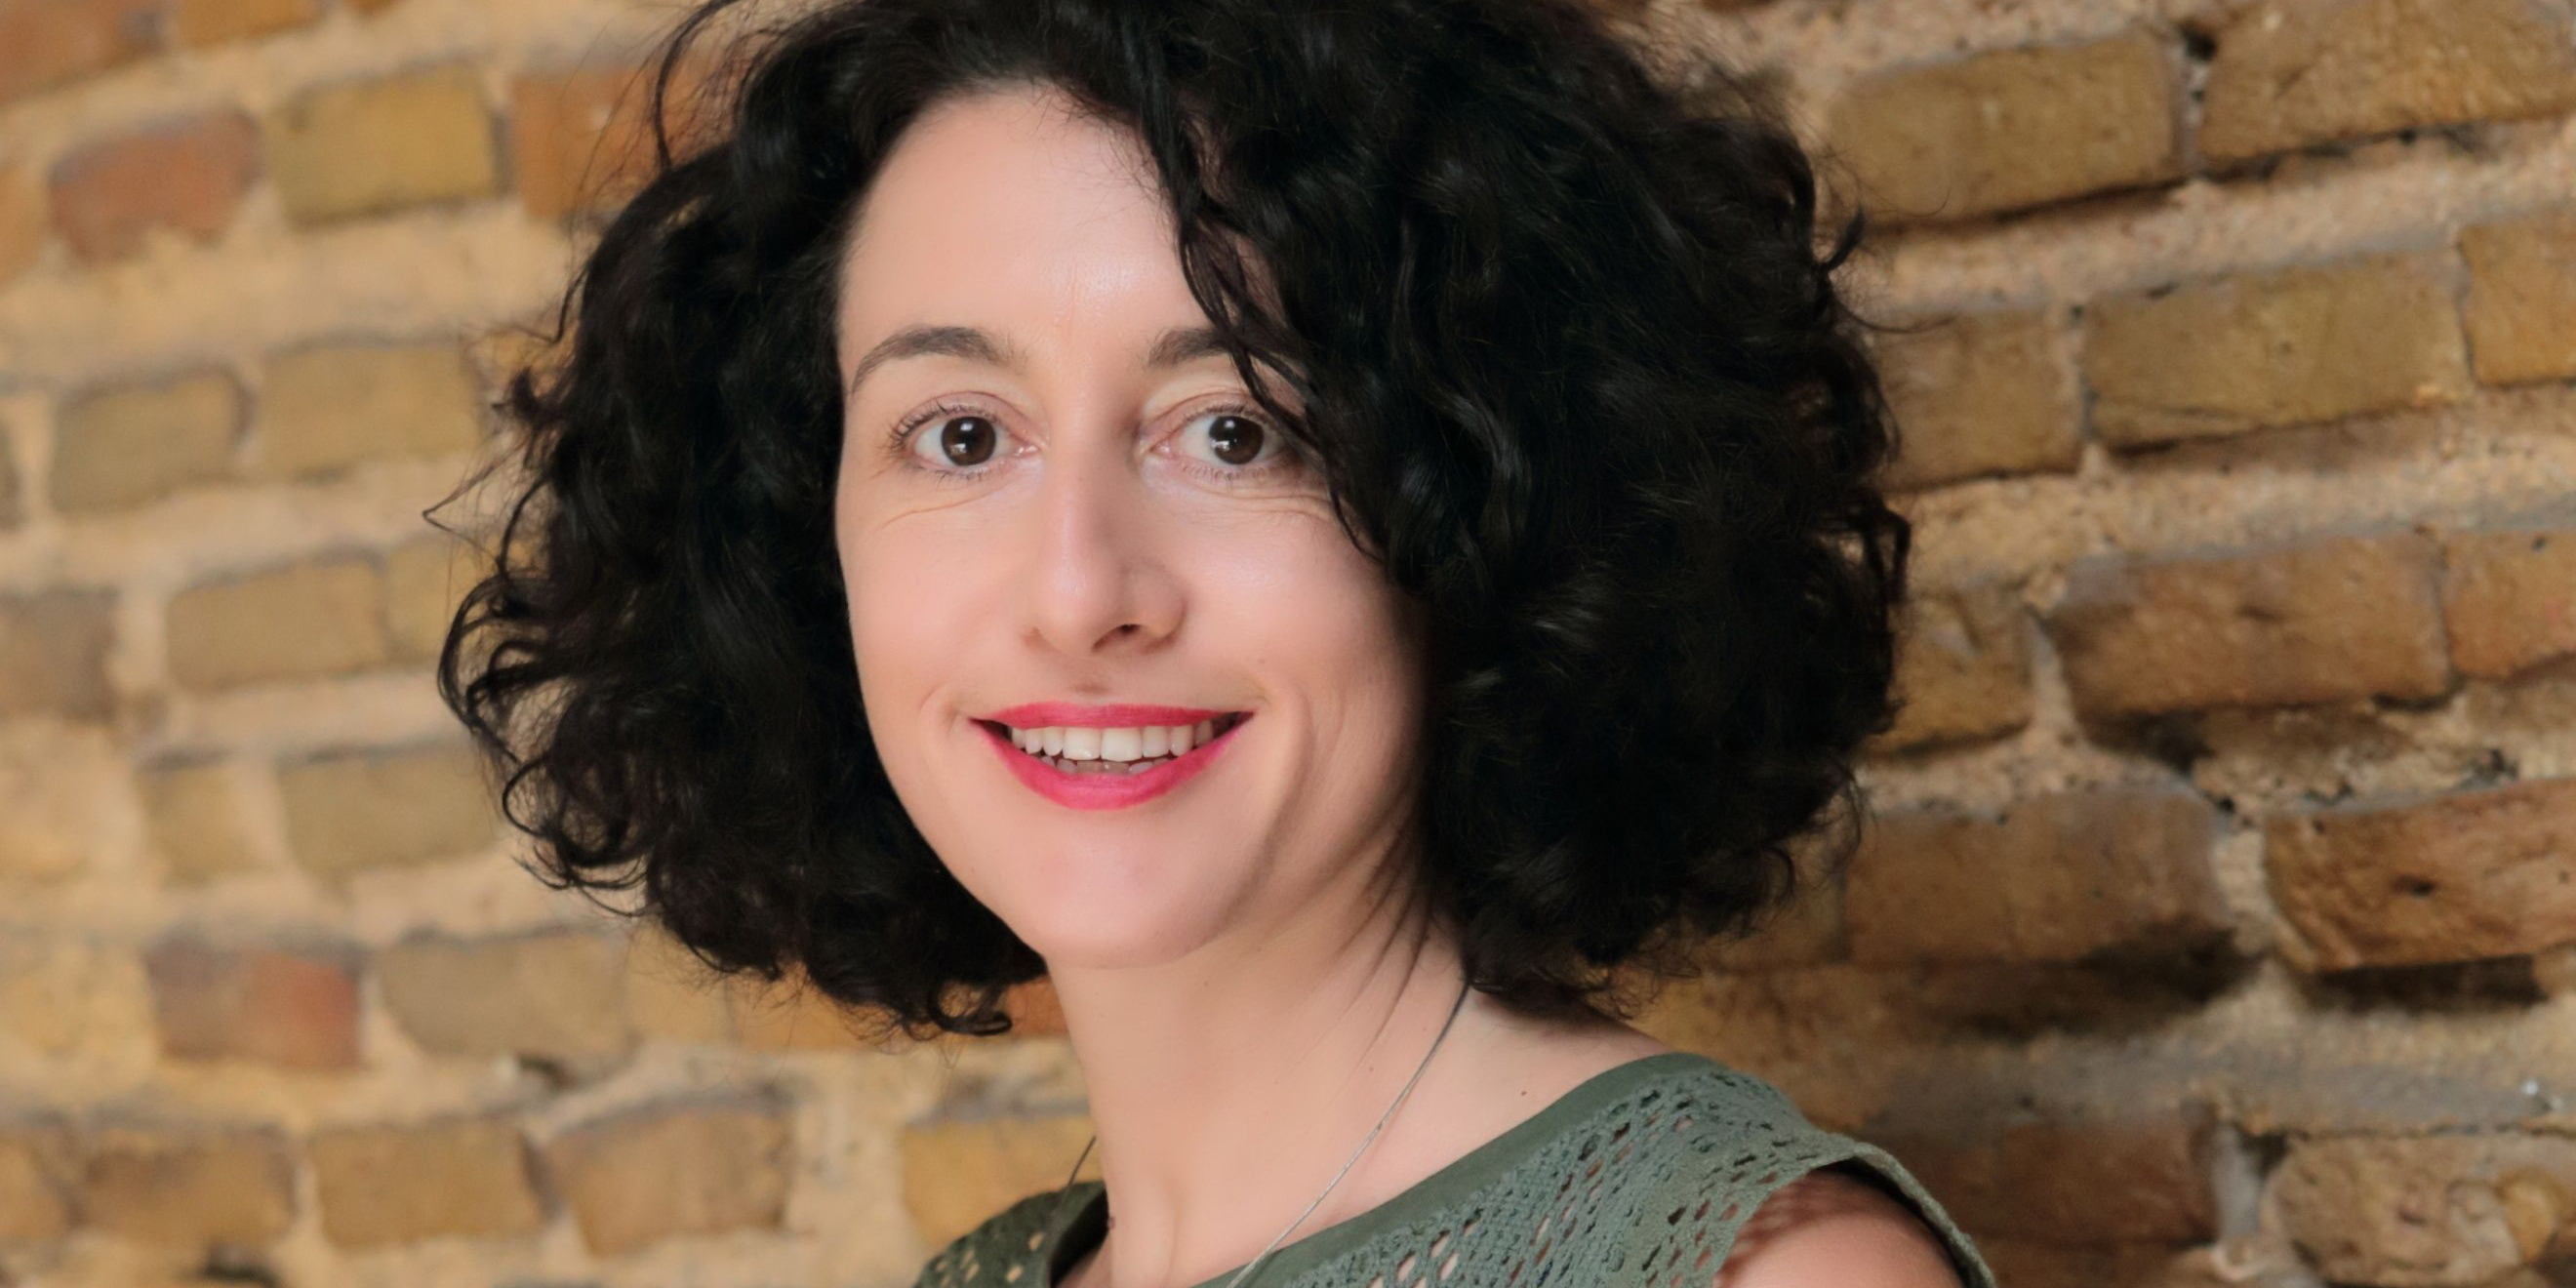 Veronika Antoniou, Cyprus, participant in the GCLP 2017 edition